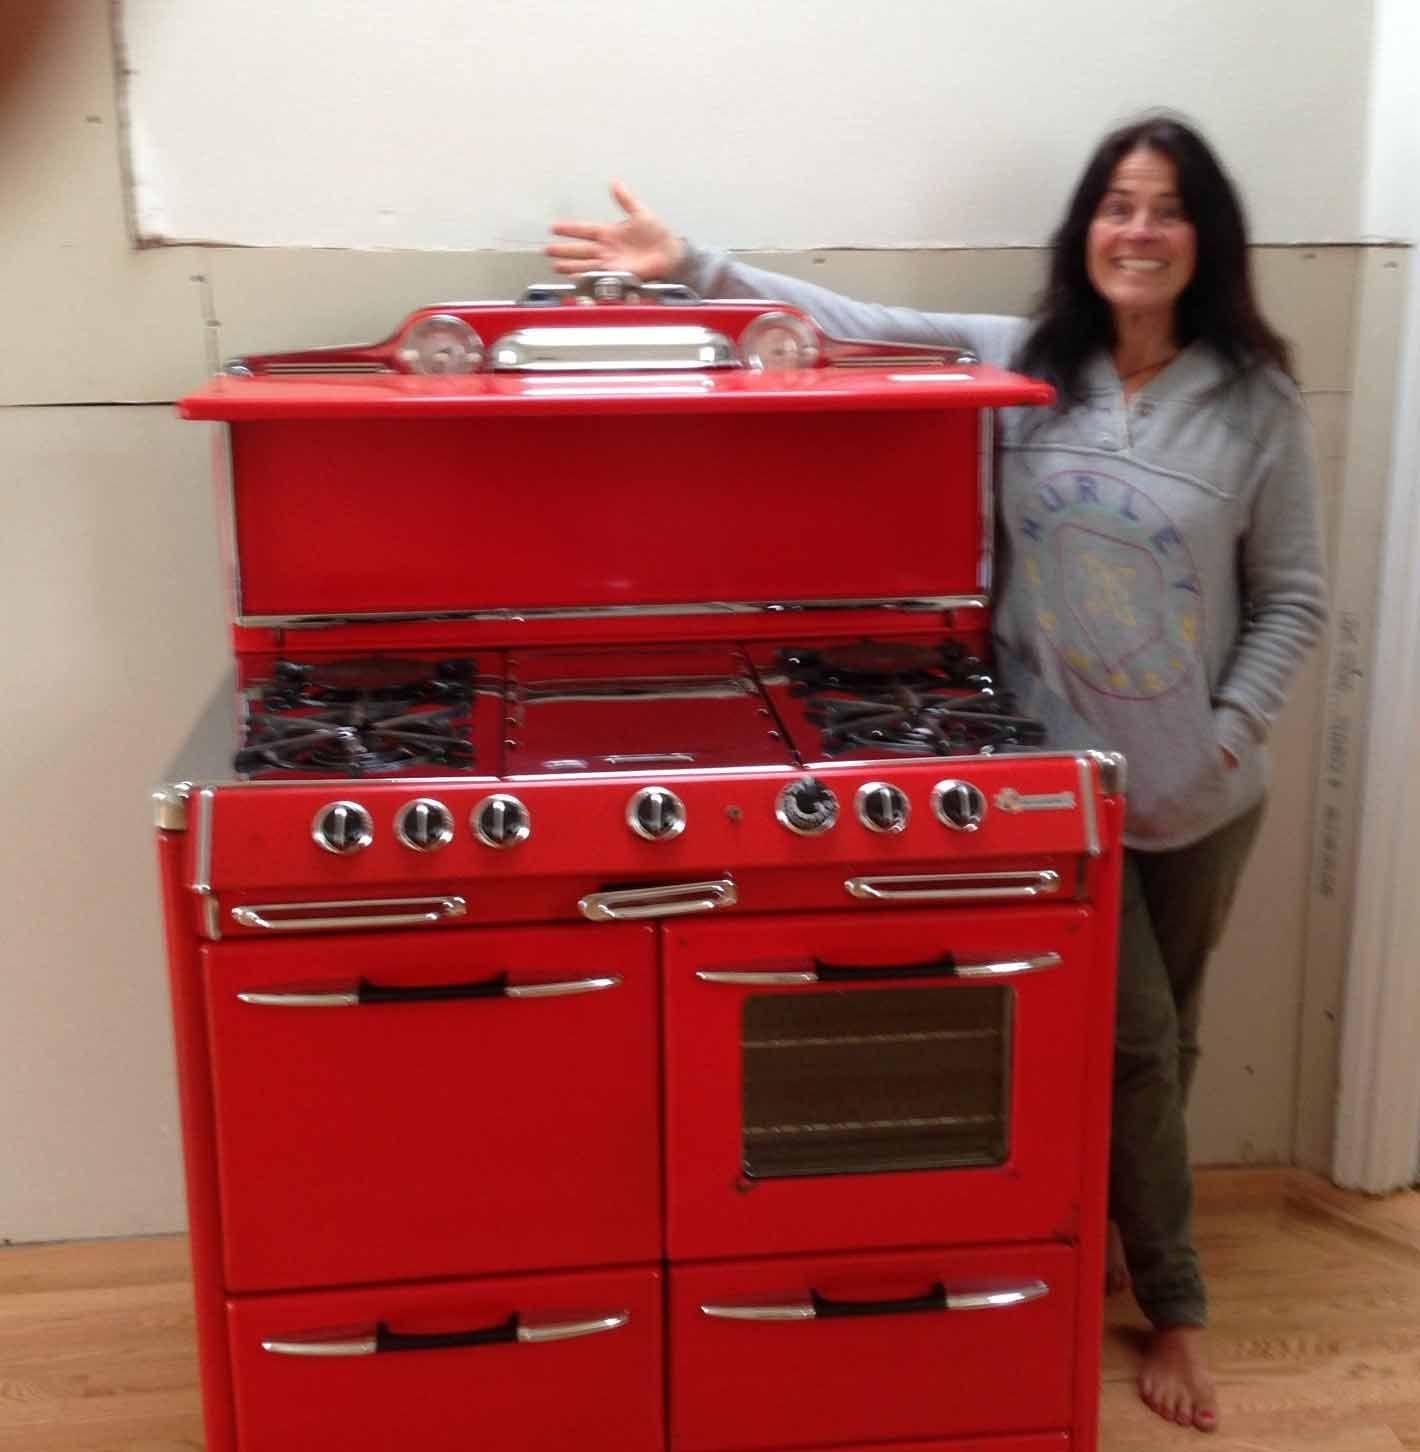 Vintage And Classic Stoves Sales In 2020 Vintage Stoves Vintage Kitchen Appliances Antique Stove